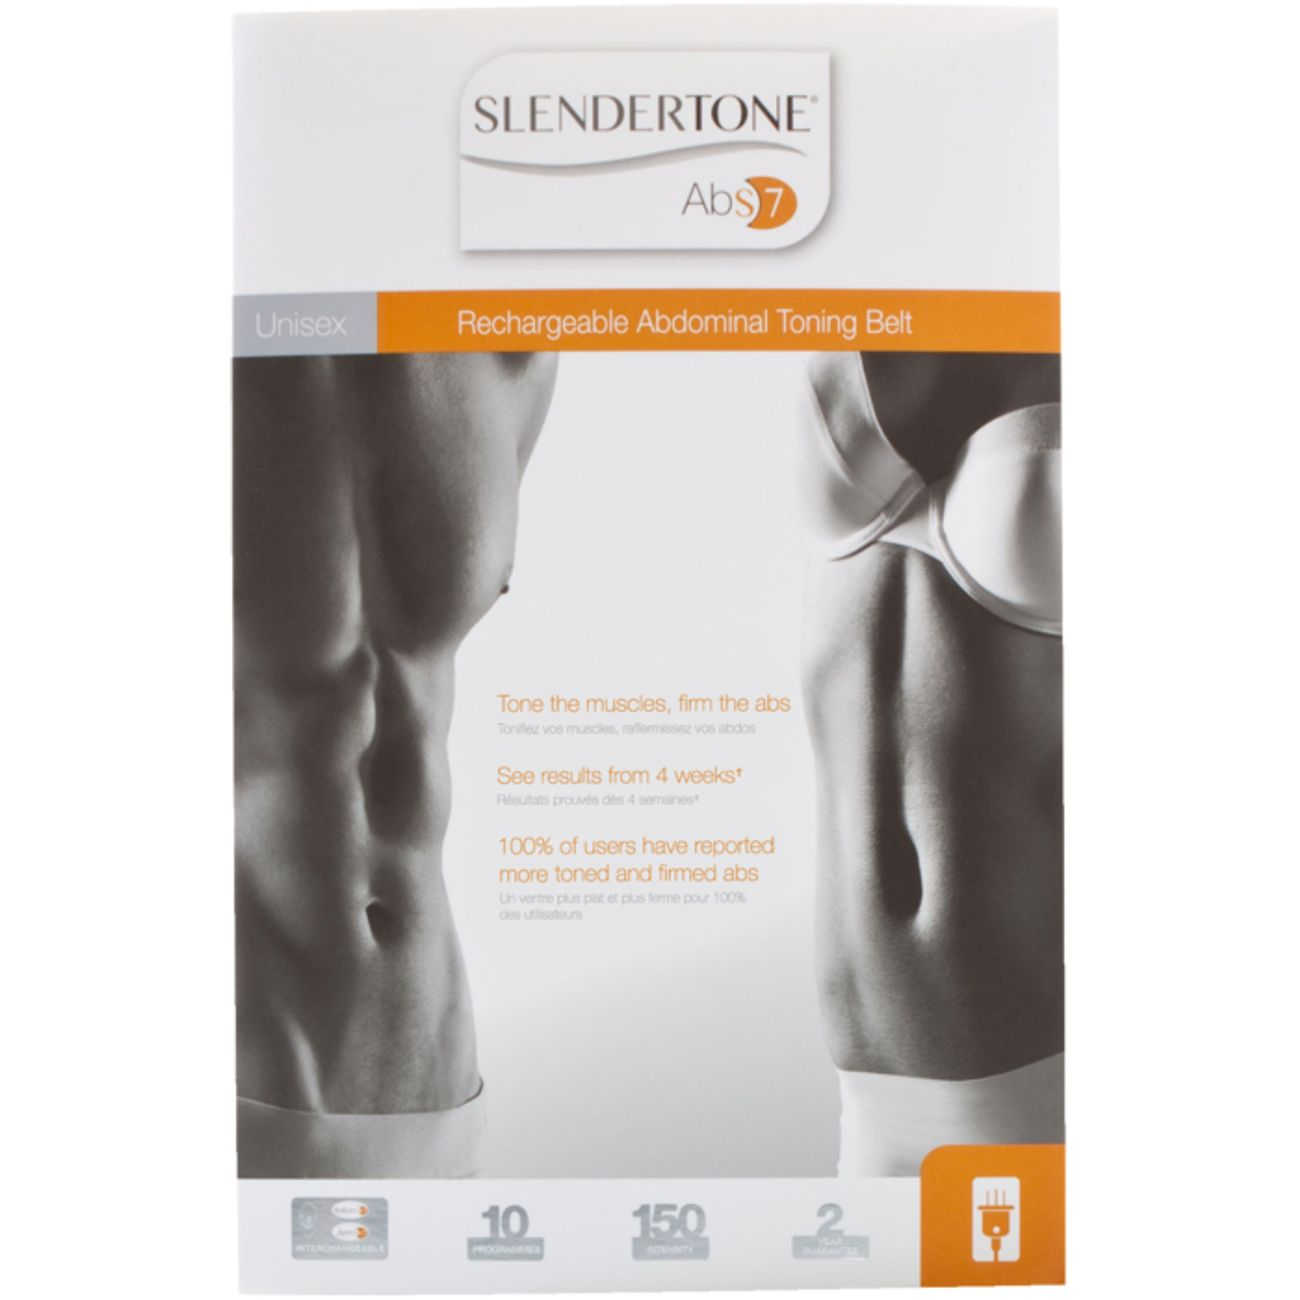 ELECTROSTIMULATION Fitness  SLENDERTONE CEINTURE ABS7